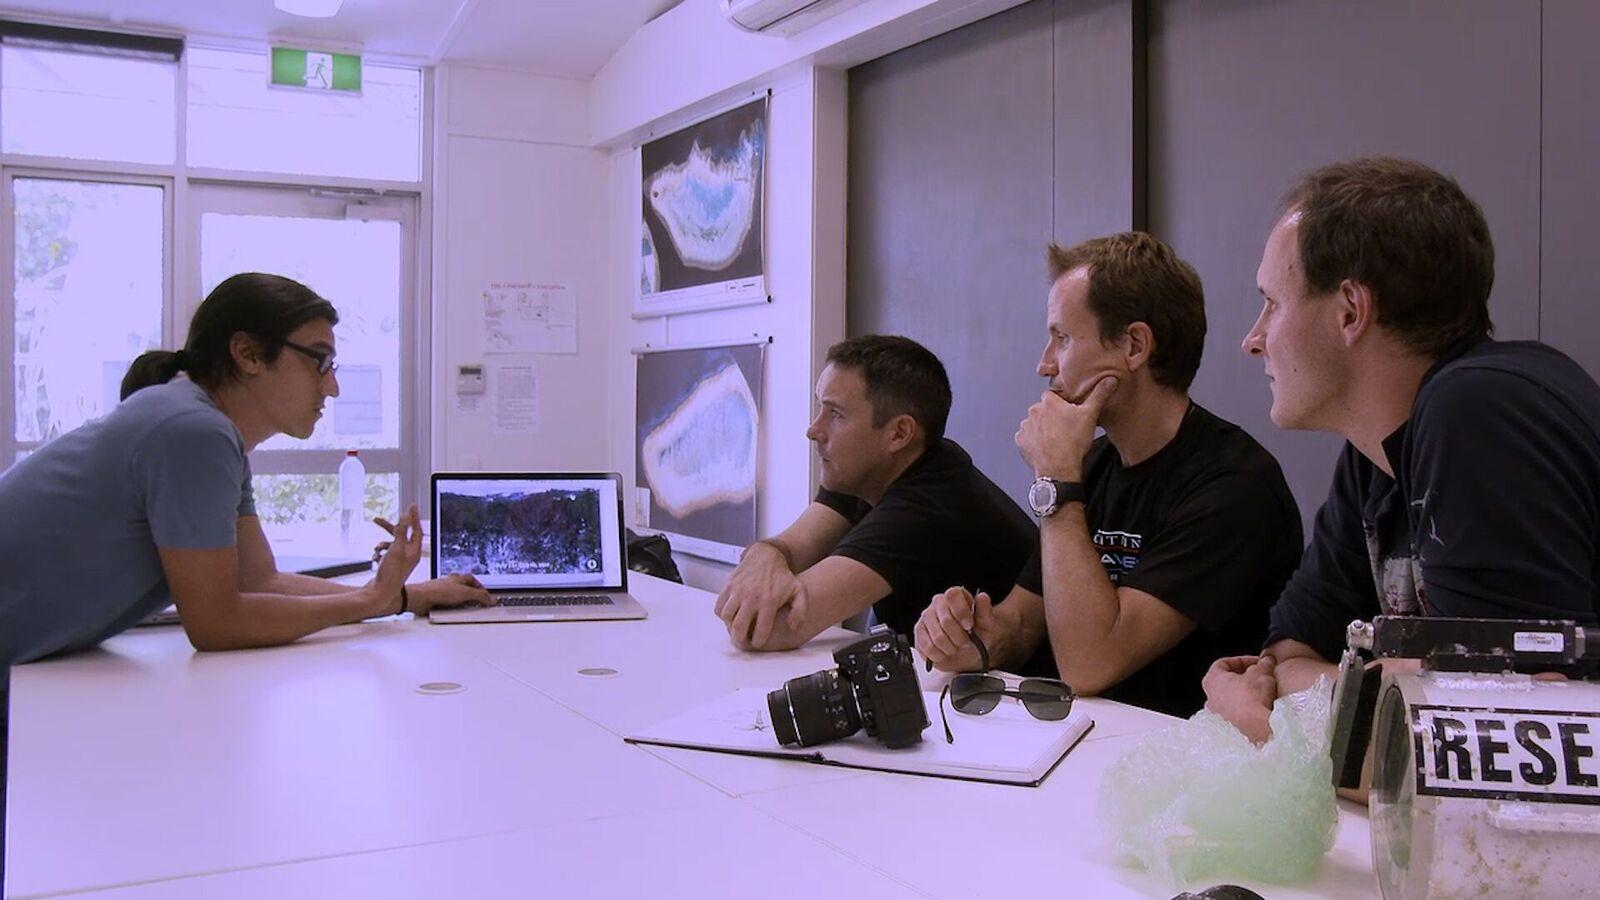 Jeff Talking To Team - Credit Netflix_preview.jpeg